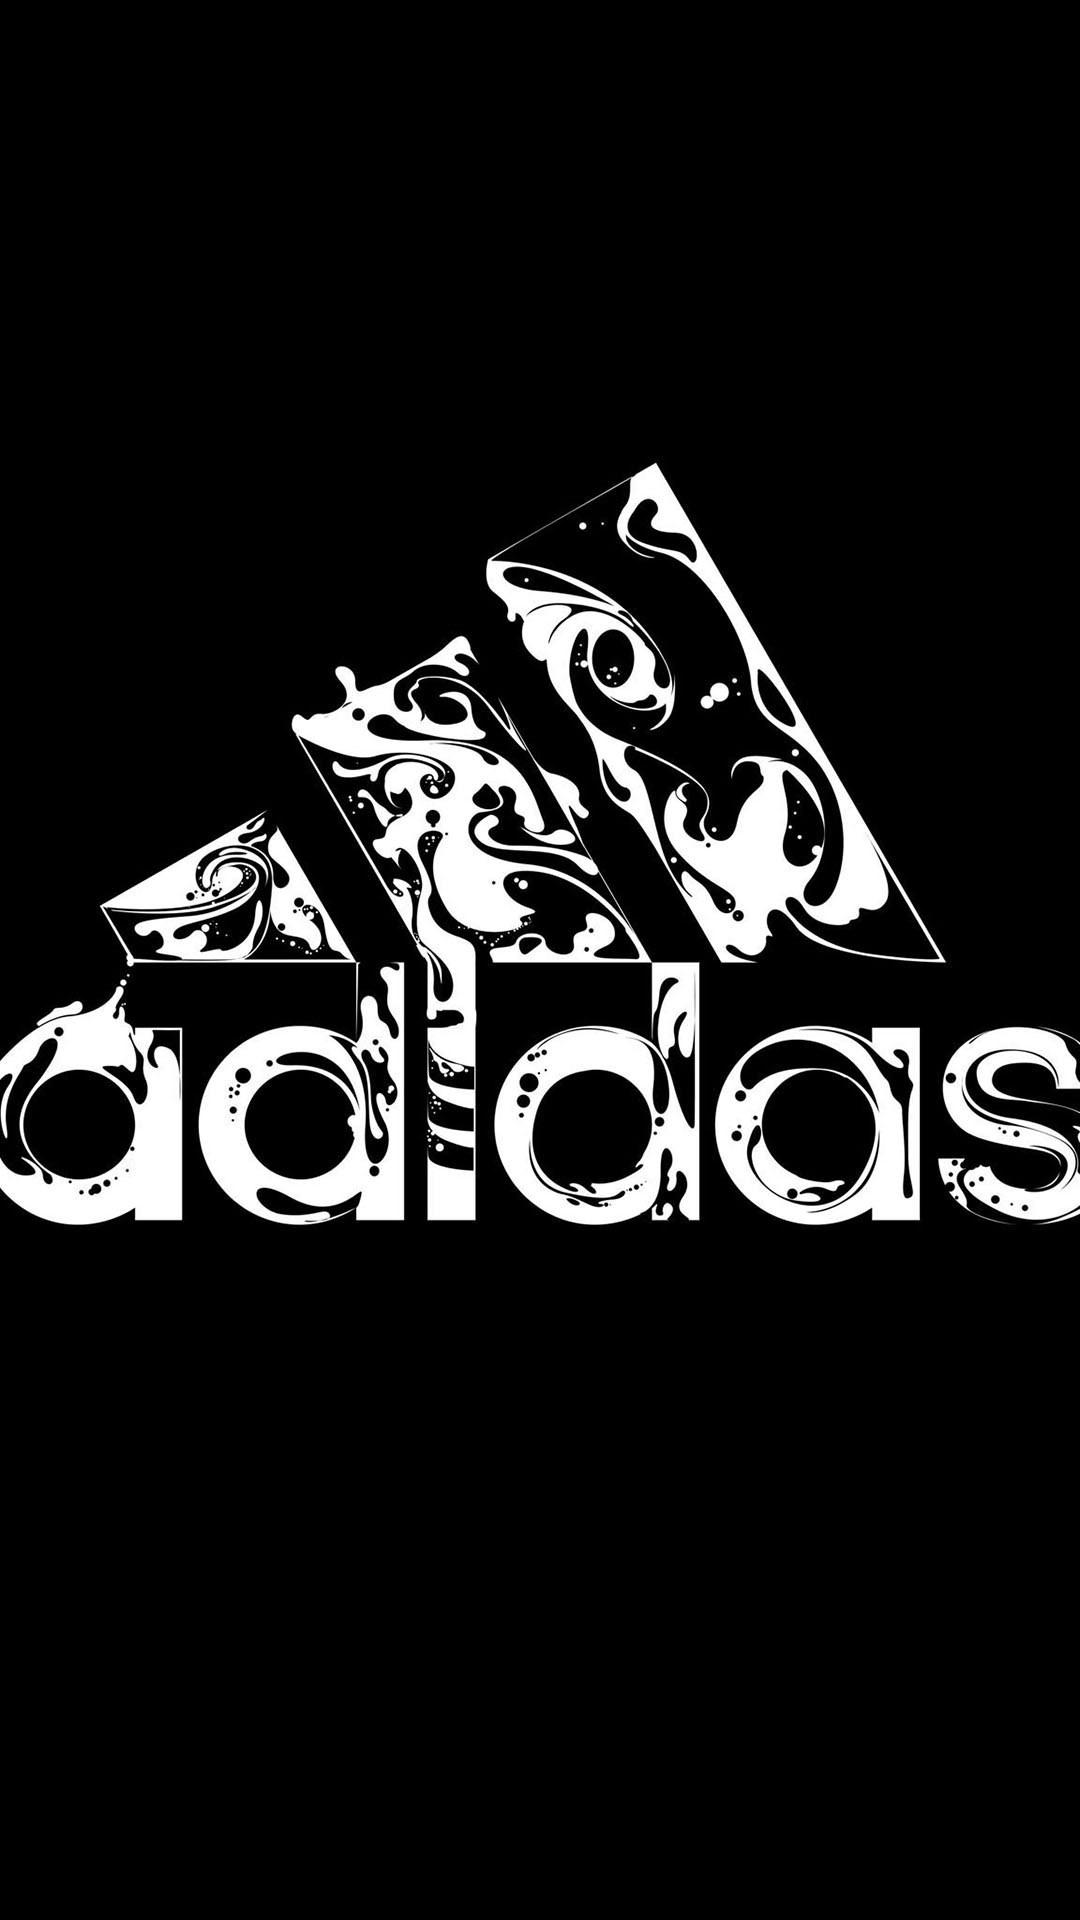 Black Adidas iPhone hd wallpaper